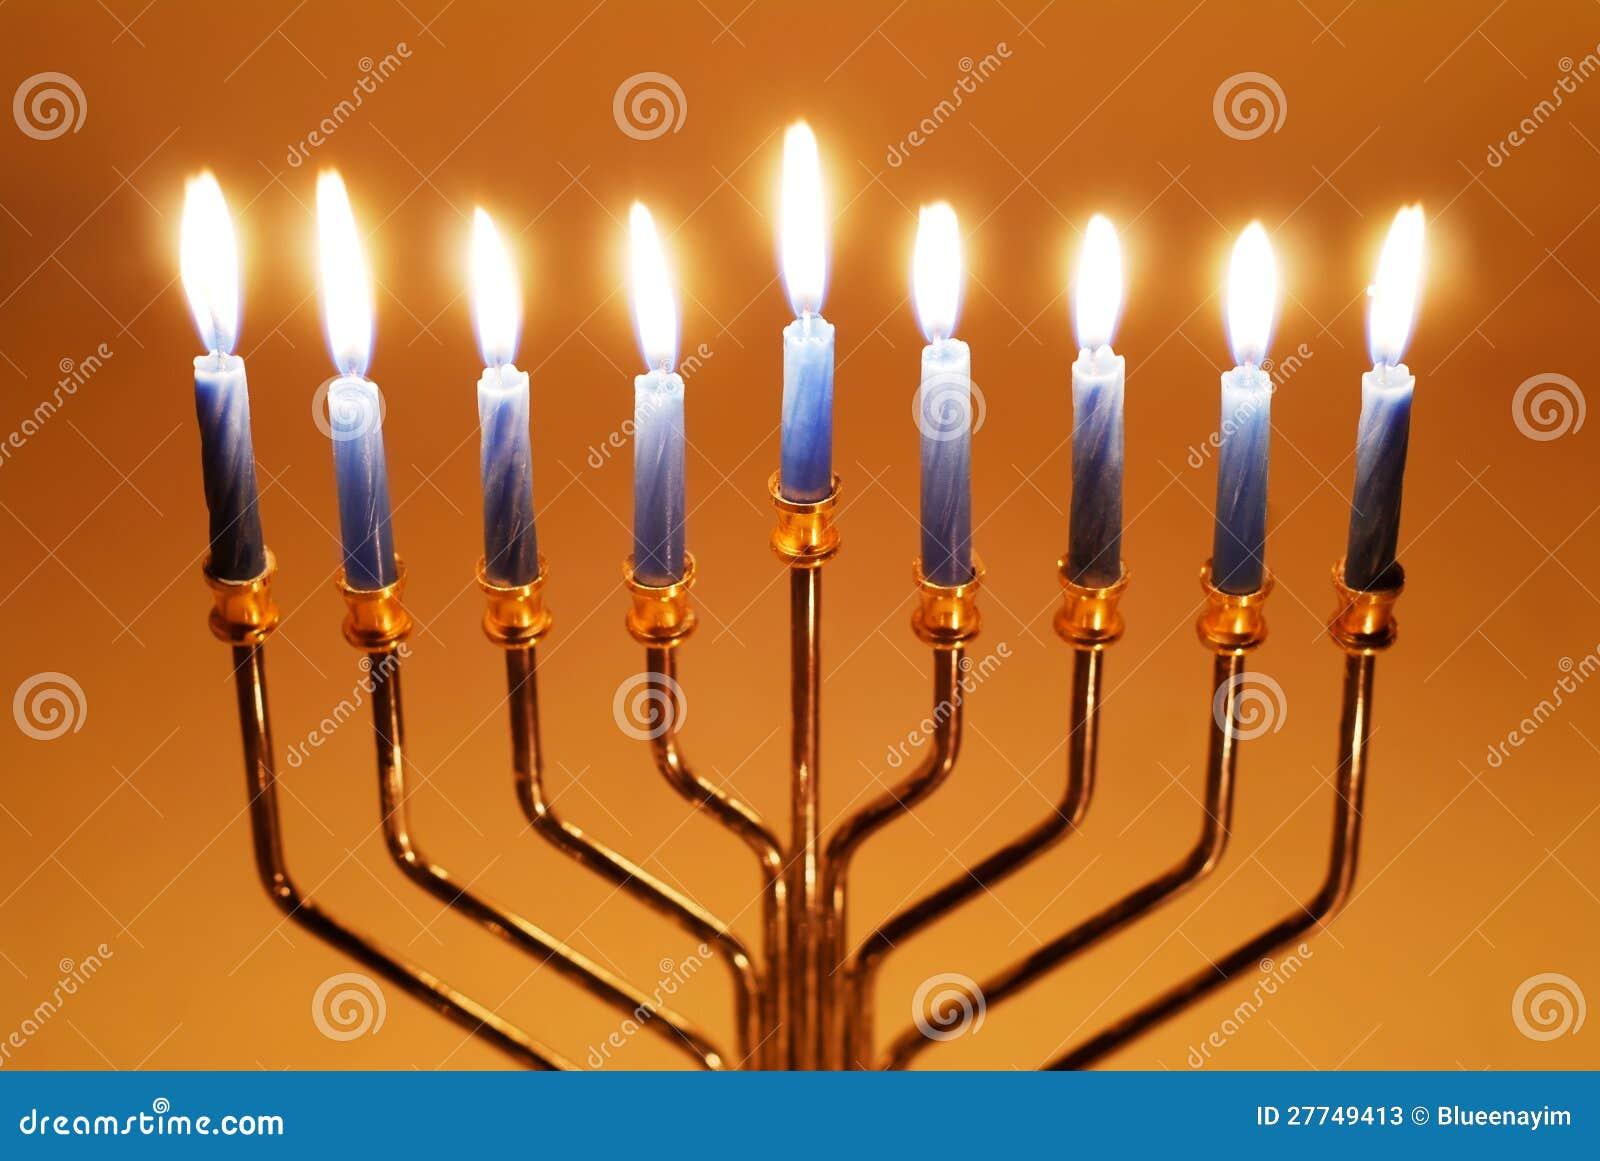 Hanukkah Candles